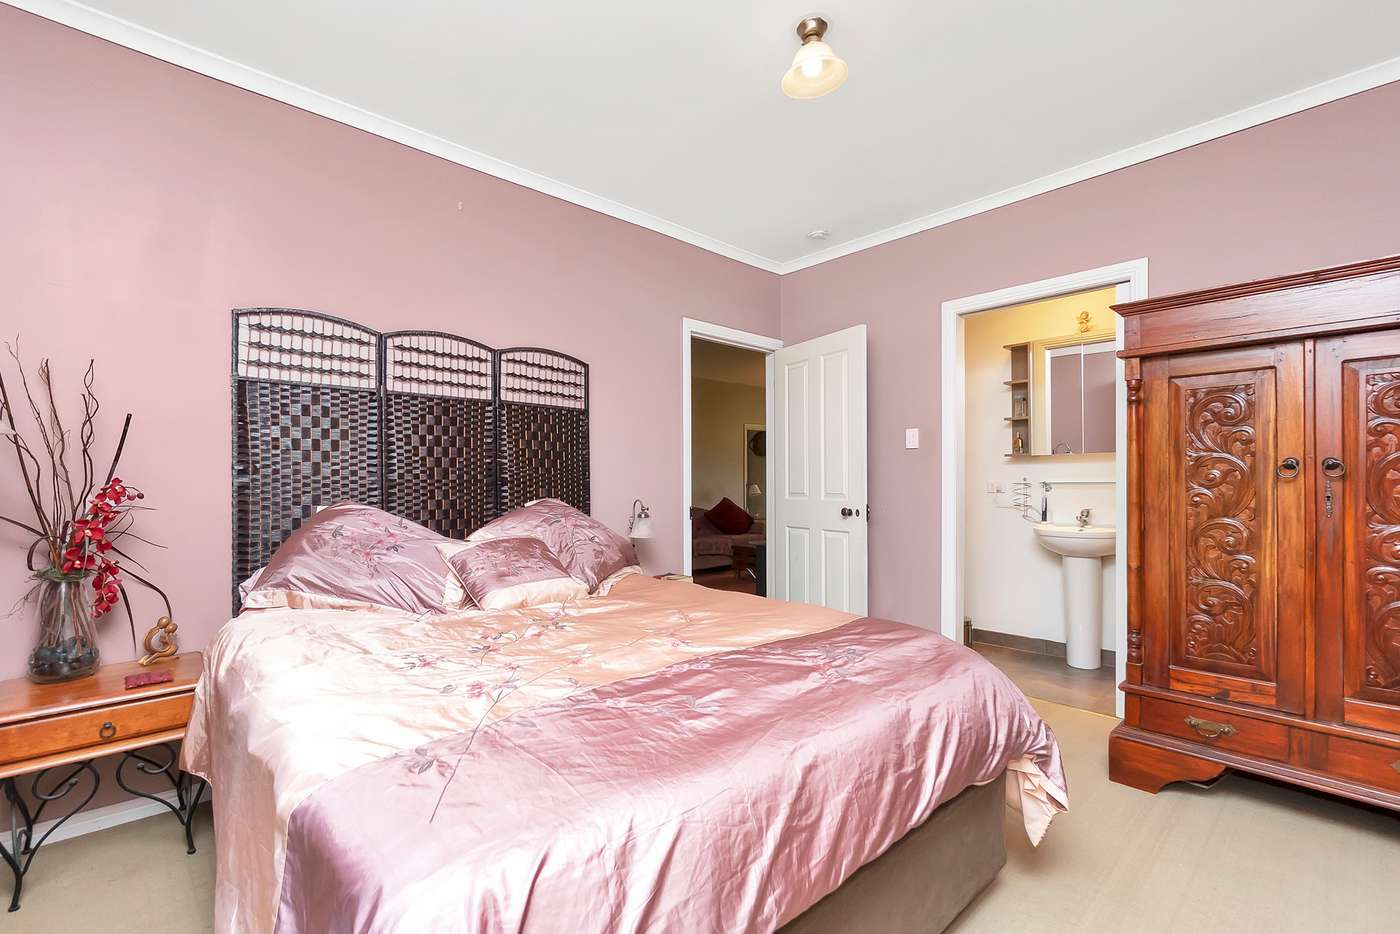 Sixth view of Homely house listing, 59 Edols Street, Ballan VIC 3342